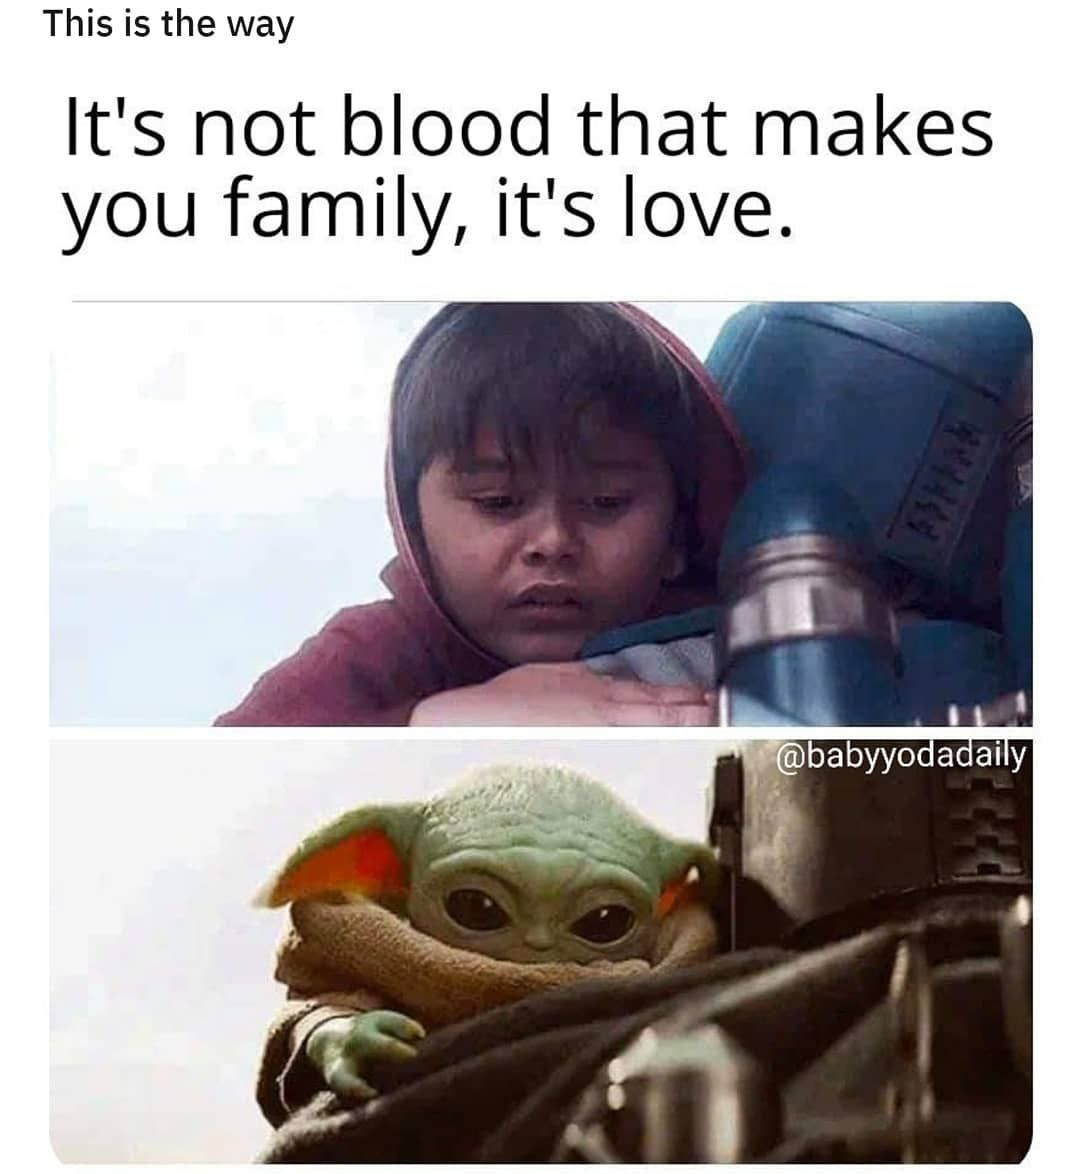 7 288 Likes 75 Comments The Real Baby Yoda Babyyodda On Instagram This Is The Way Babyyodaism Star Wars Humor Star Wars Jokes Star Wars Fandom